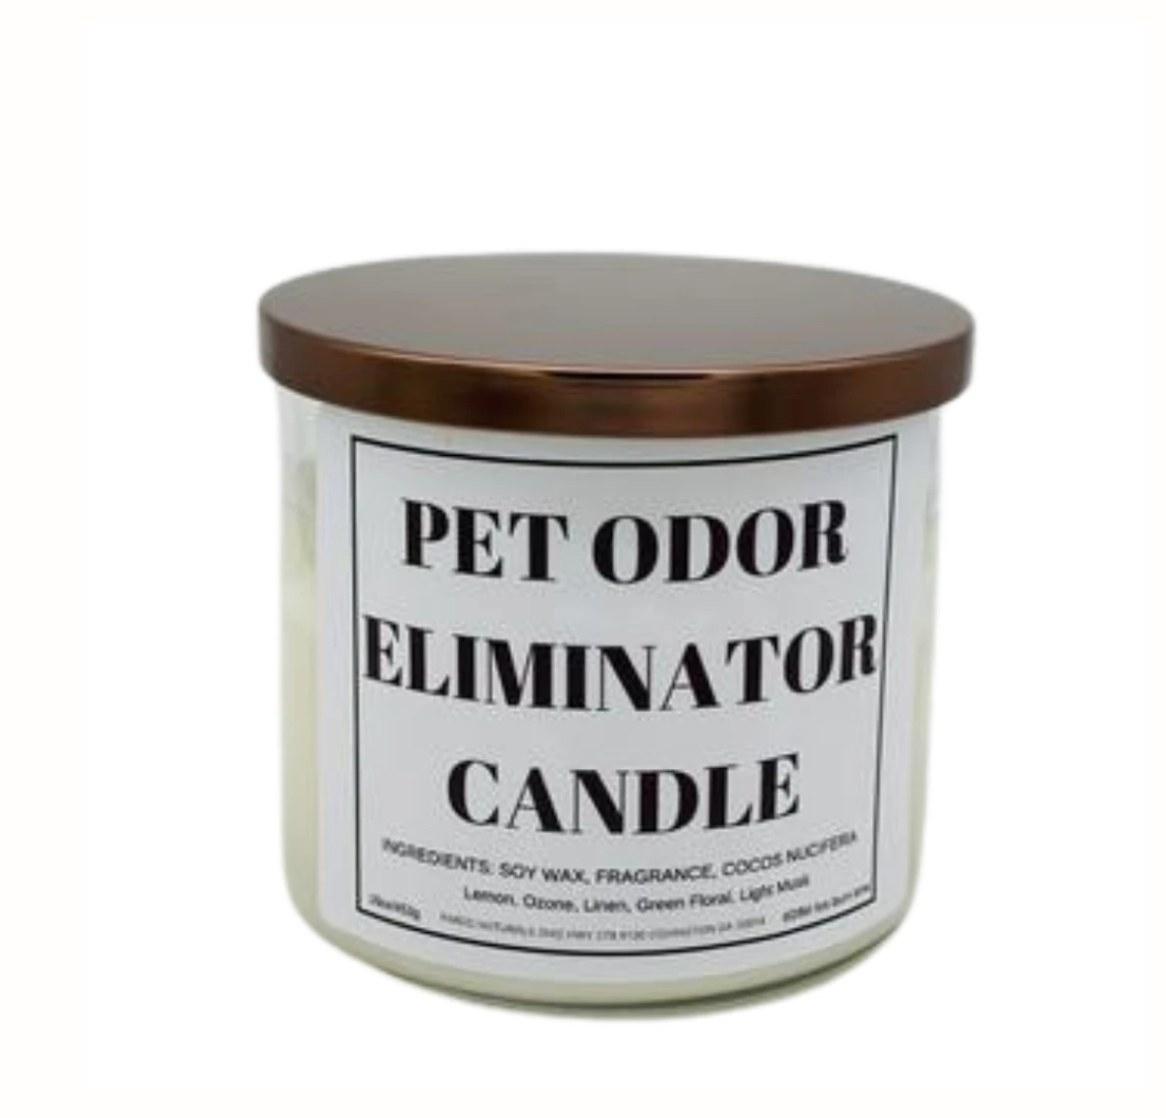 The pet odor eliminator candle